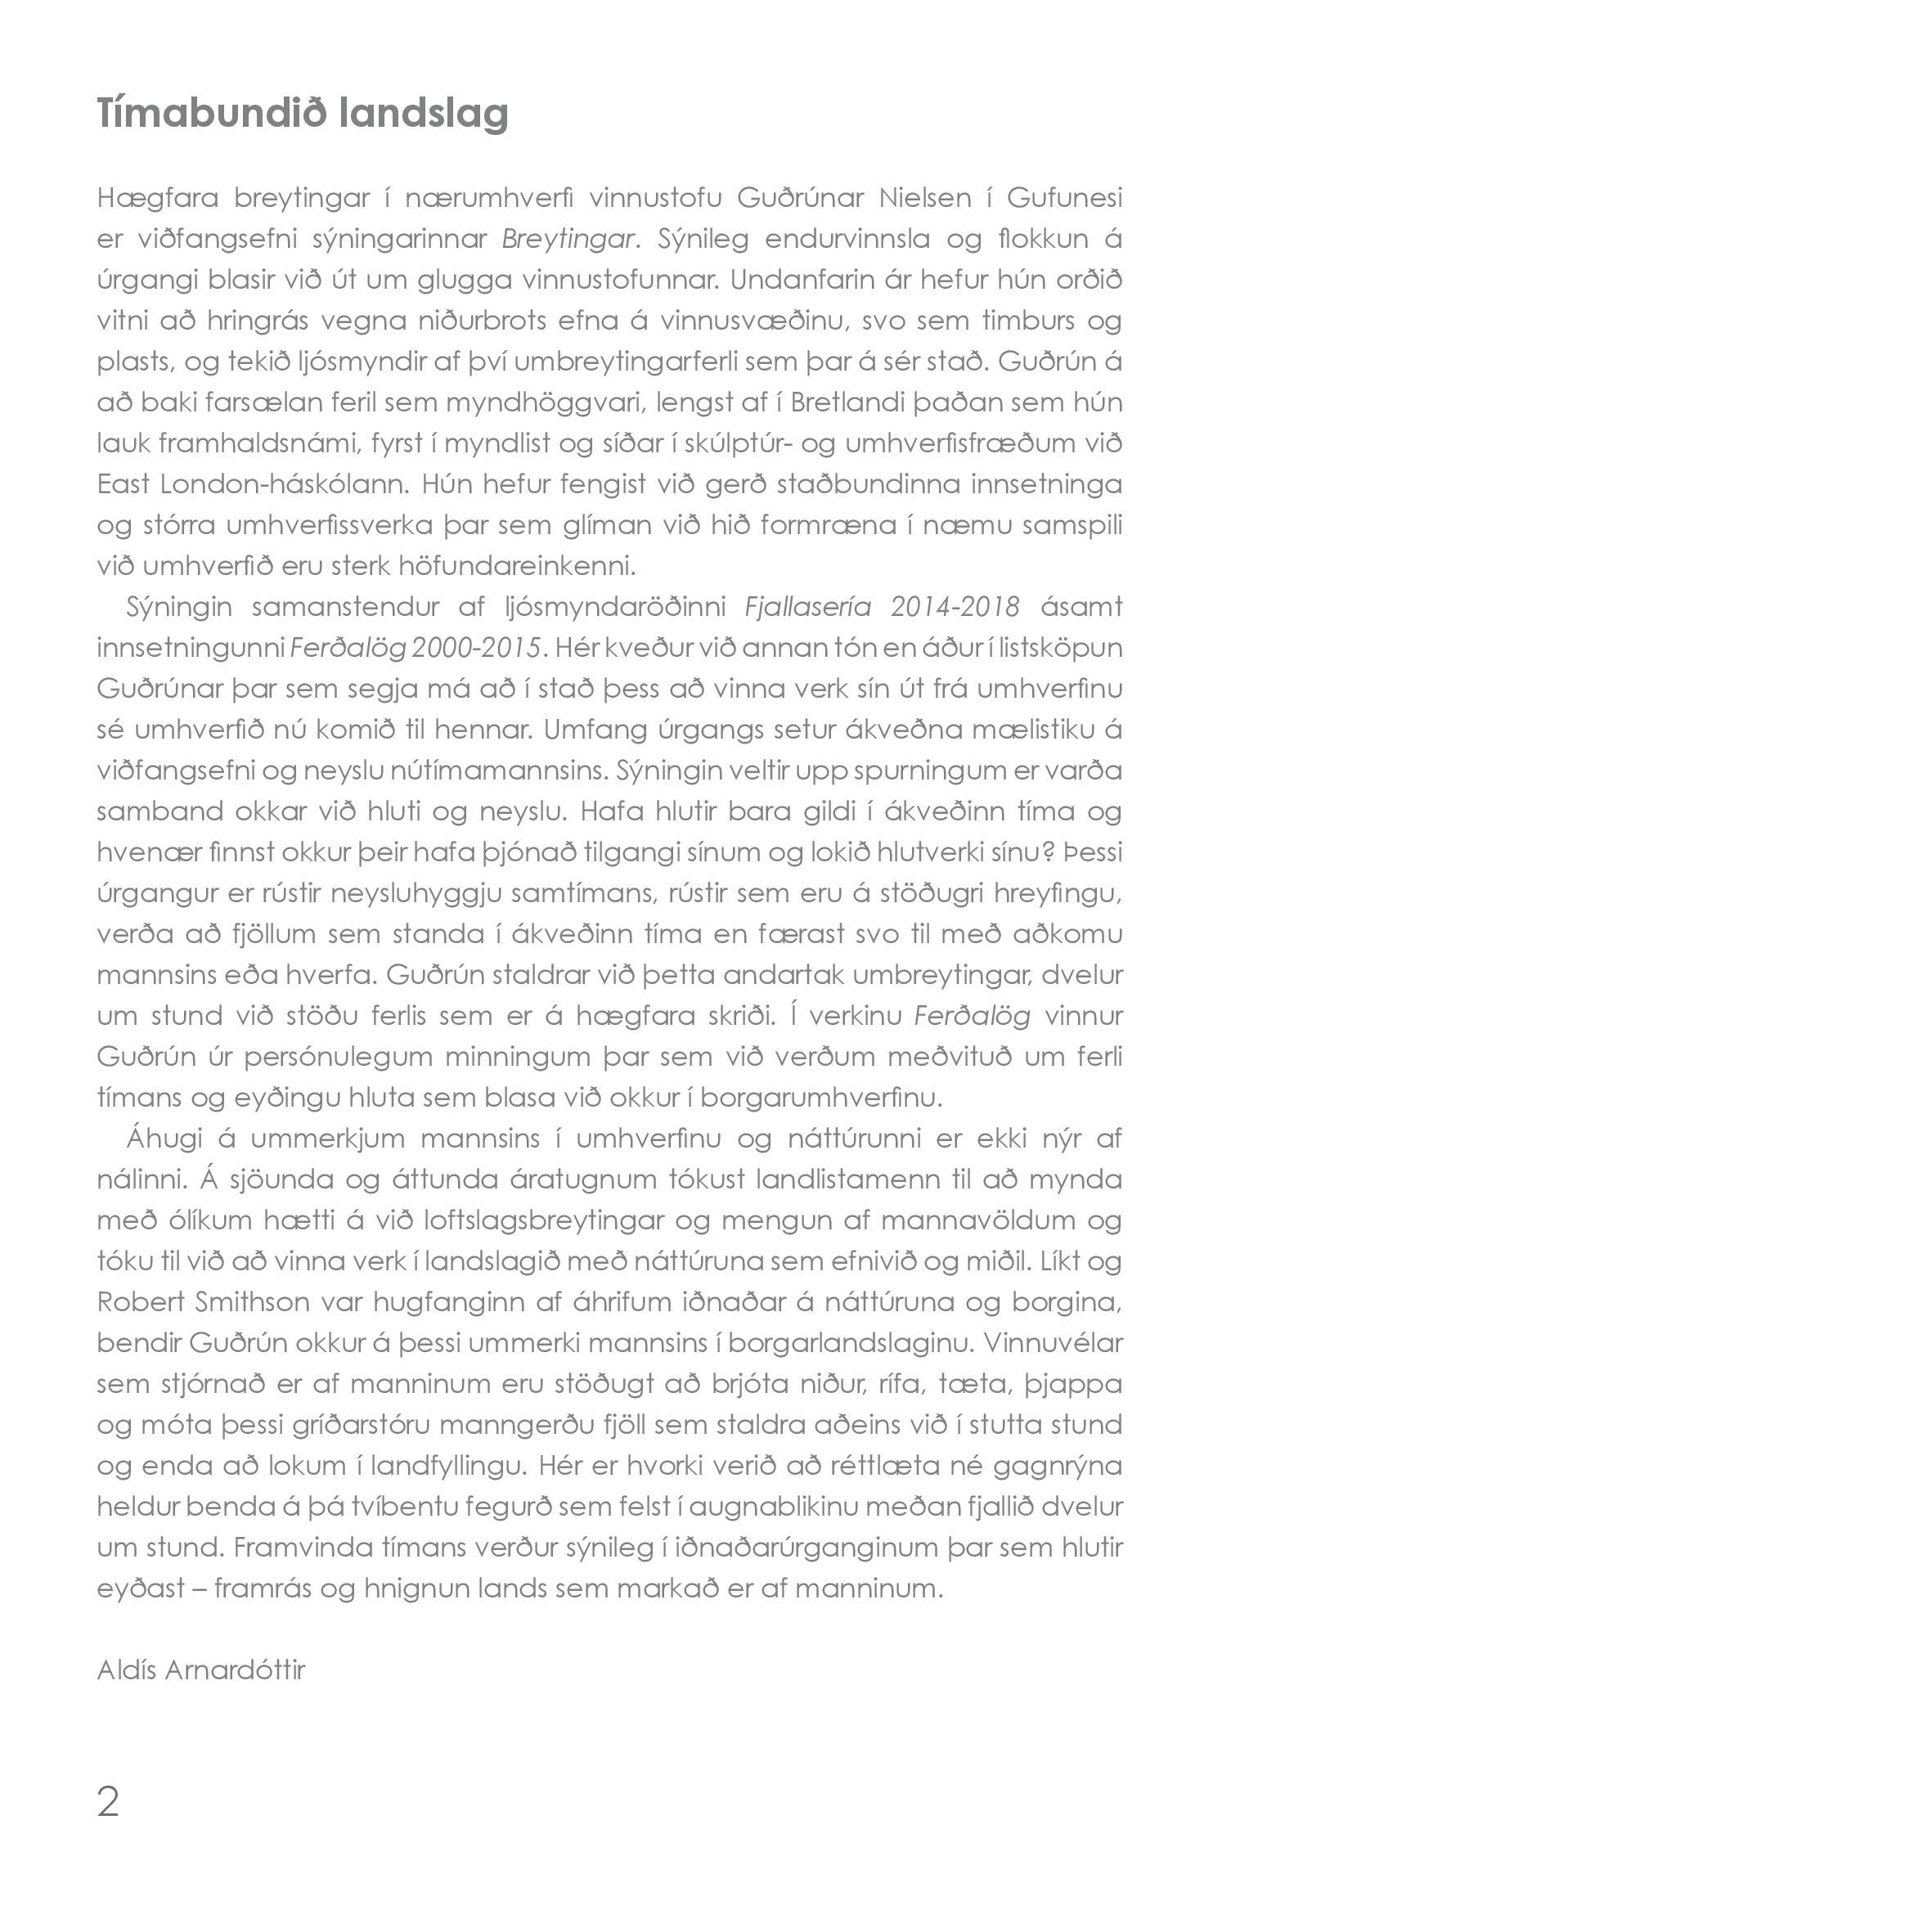 39433_GudrunNielsen (1)-page-002.jpg